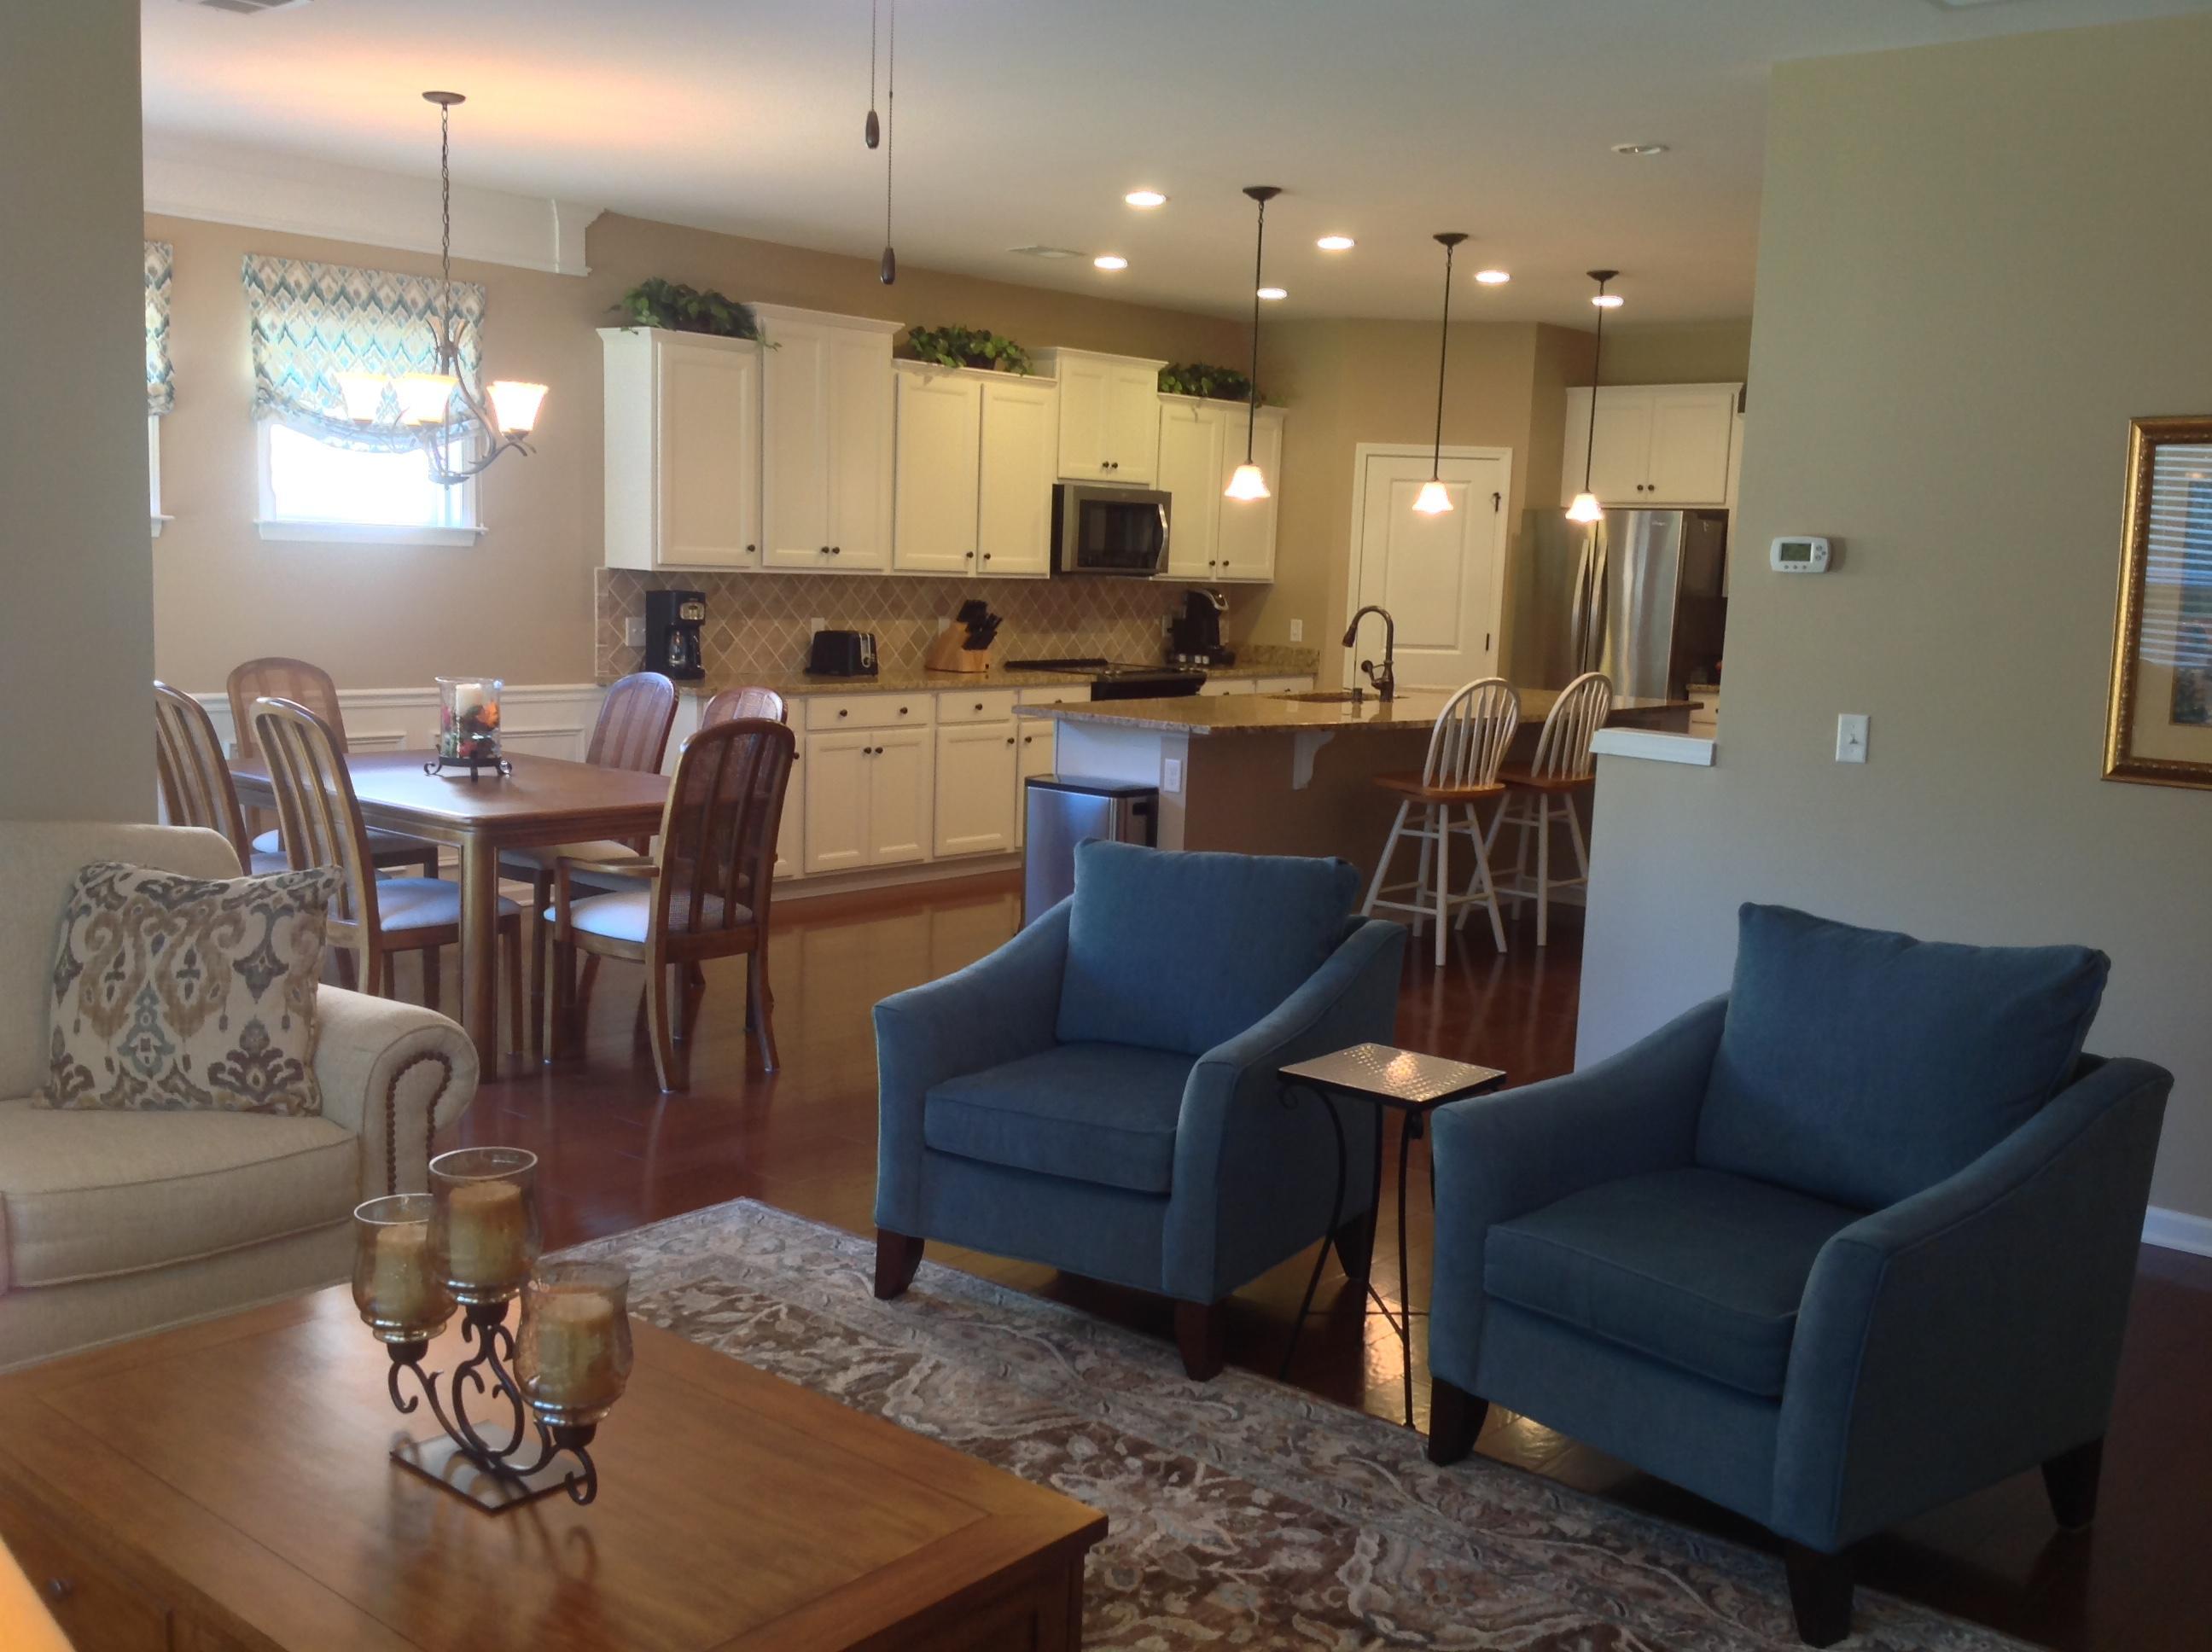 Cane Bay Plantation Homes For Sale - 547 Eastern Isle, Summerville, SC - 7